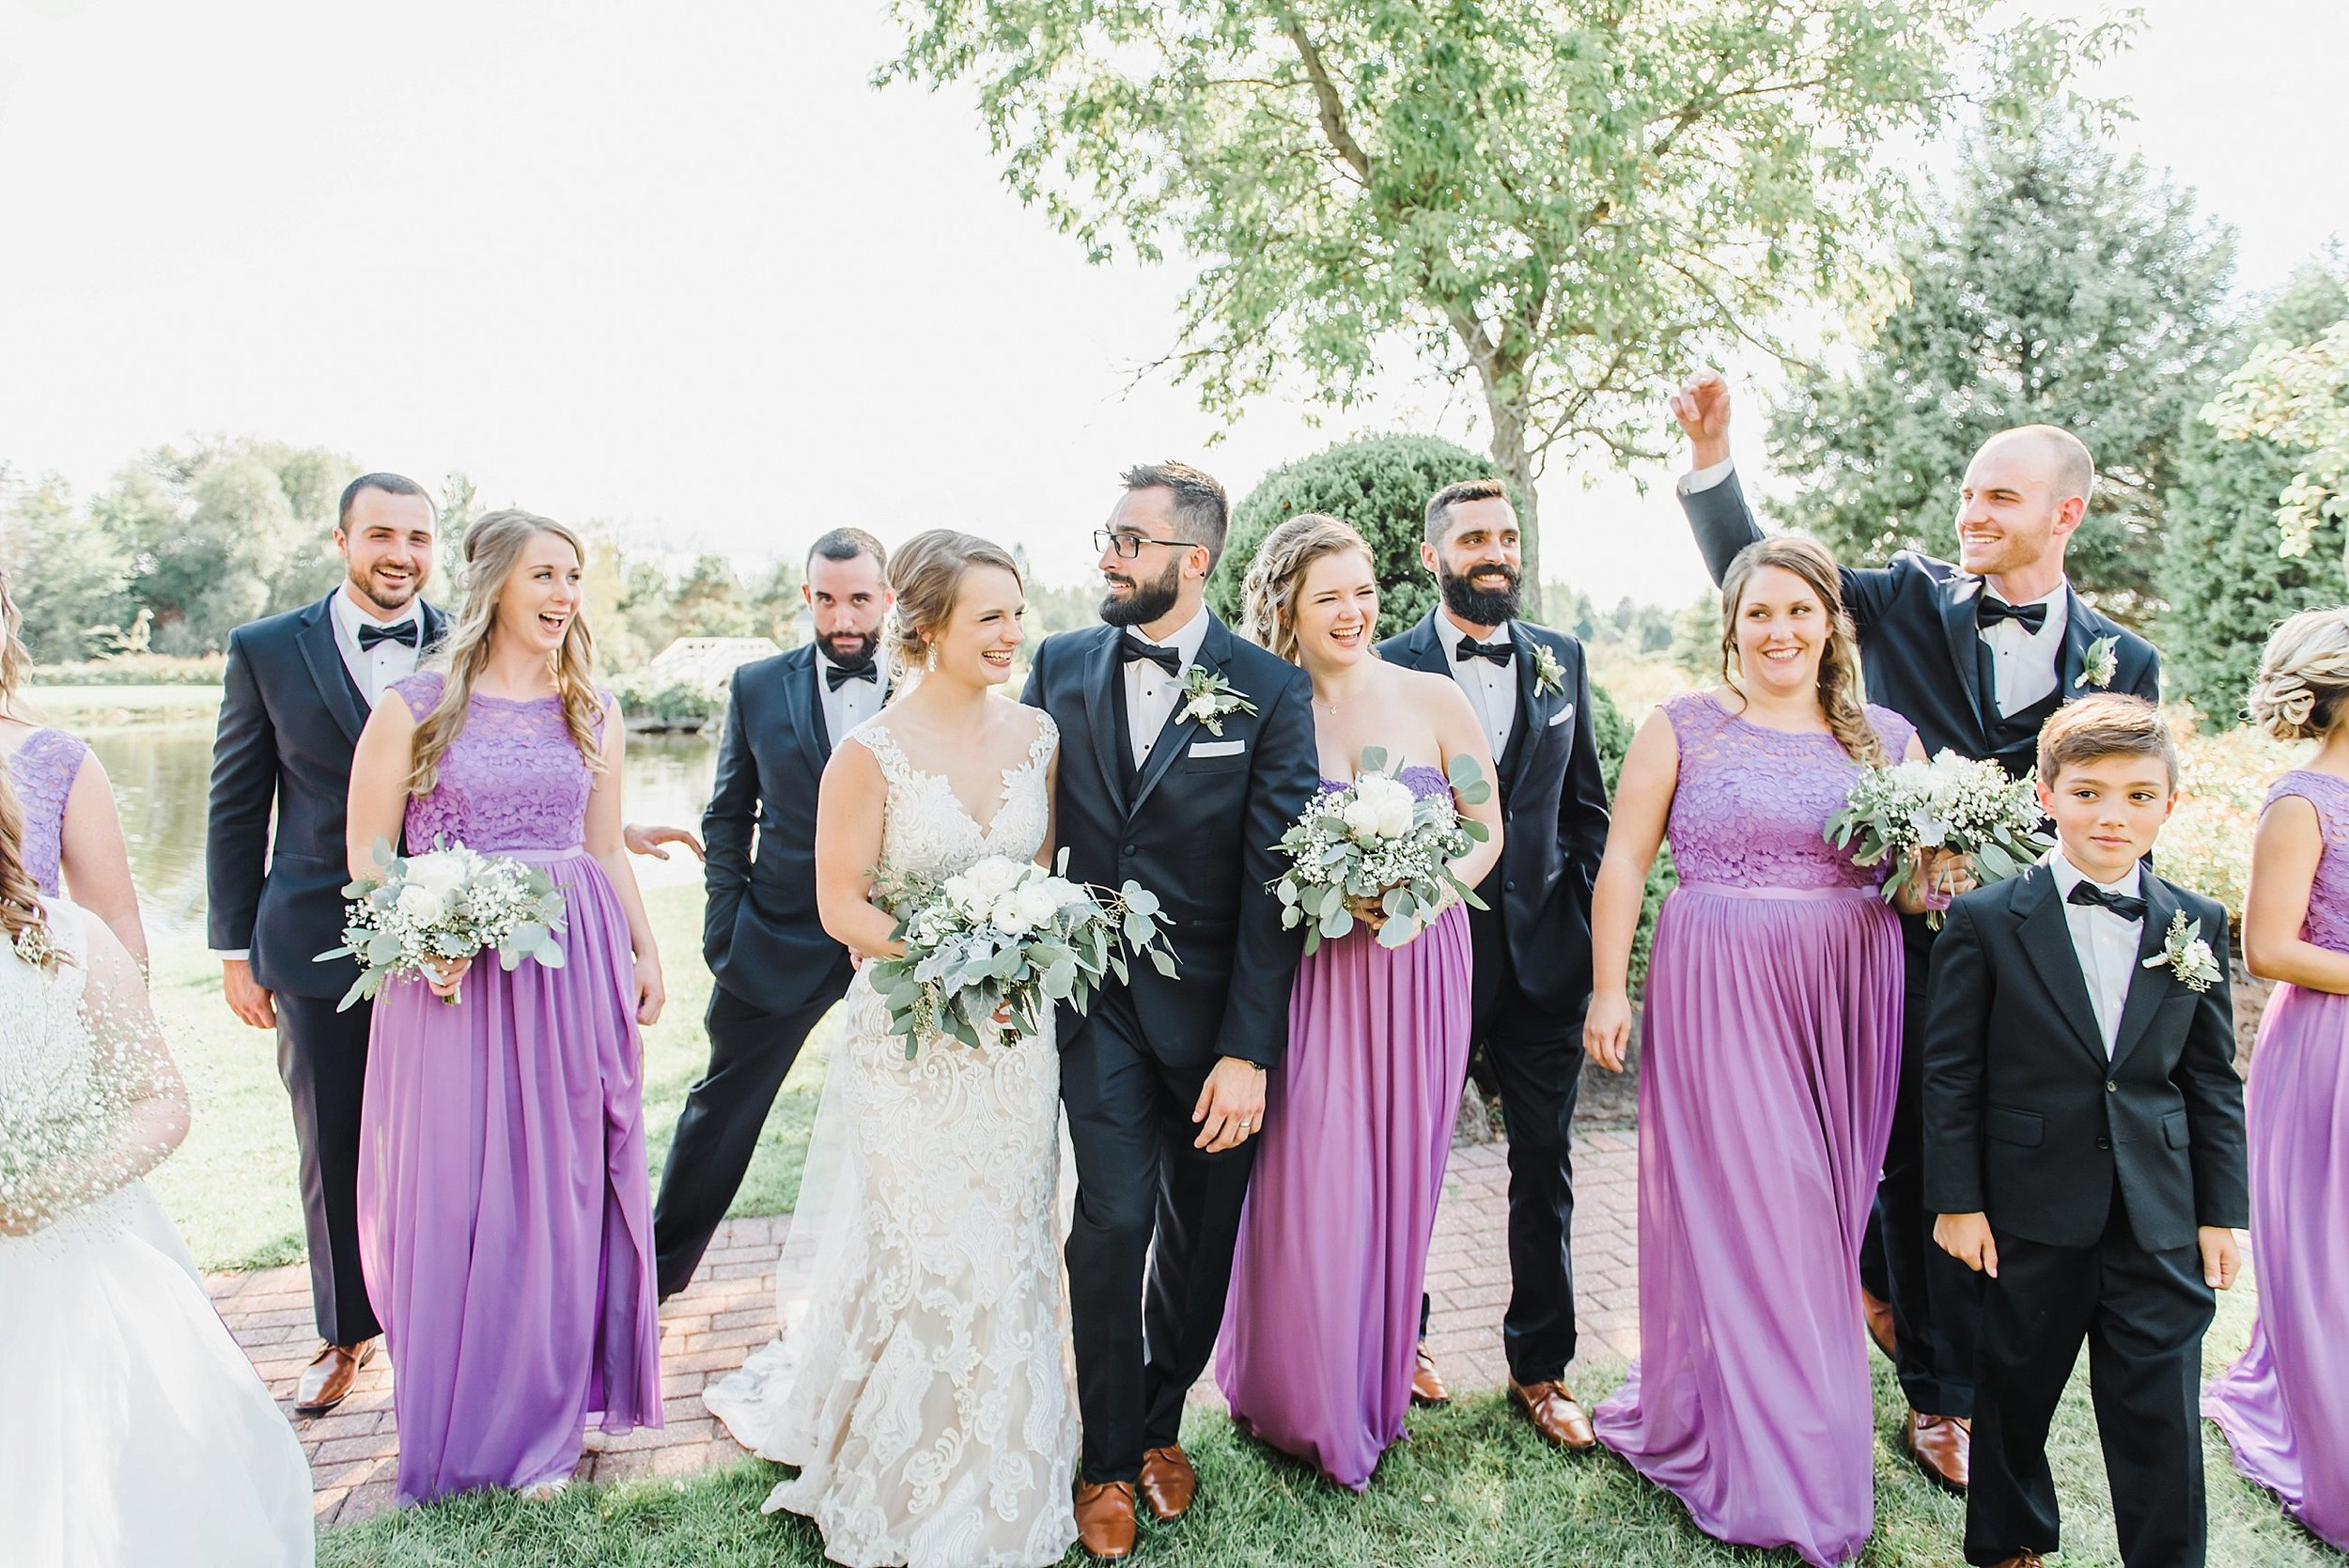 light airy indie fine art ottawa wedding photographer | Ali and Batoul Photography_1285.jpg